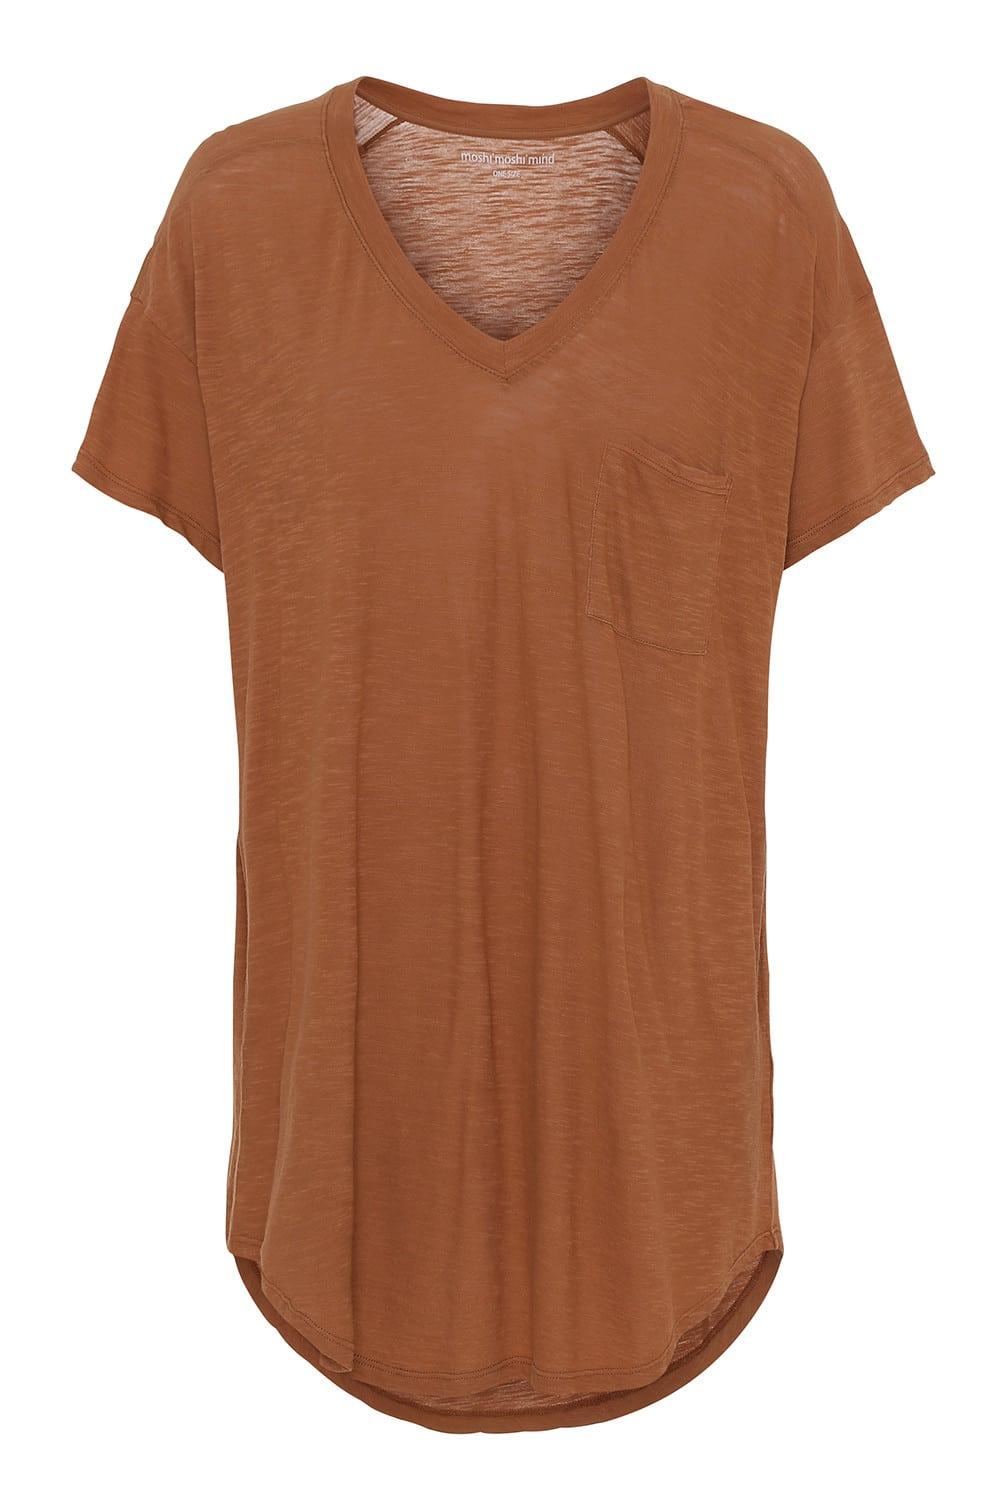 Dreamy t-shirt hazel fra Moshi moshi mind.